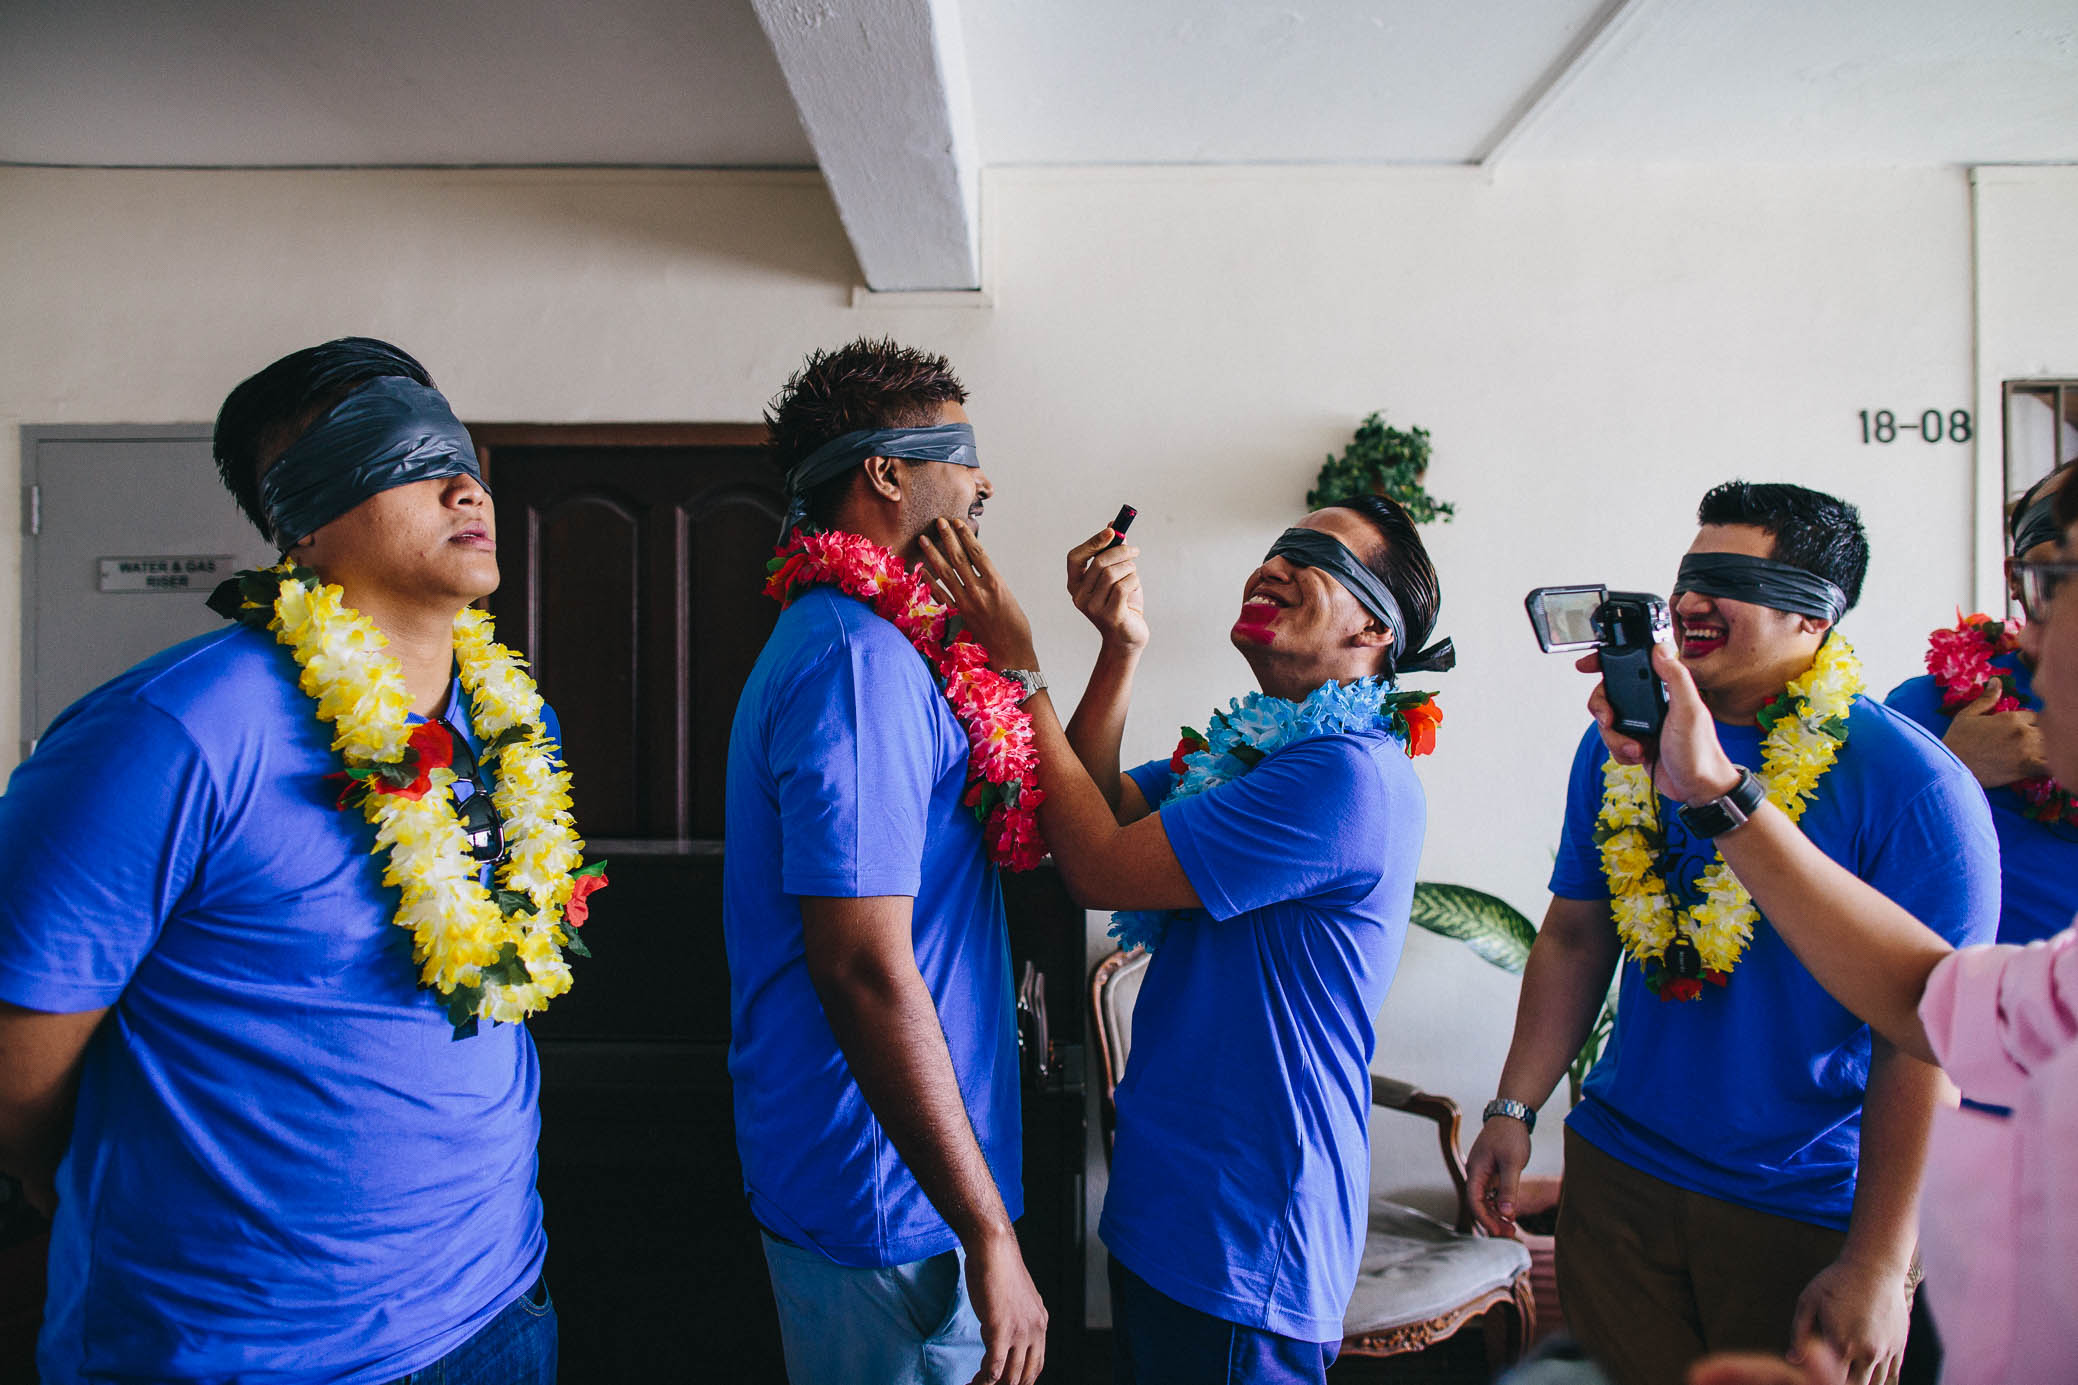 singapore-wedding-photographer-malay-indian-pre-wedding-travel-wmt-2015-alif-ethel-15.jpg